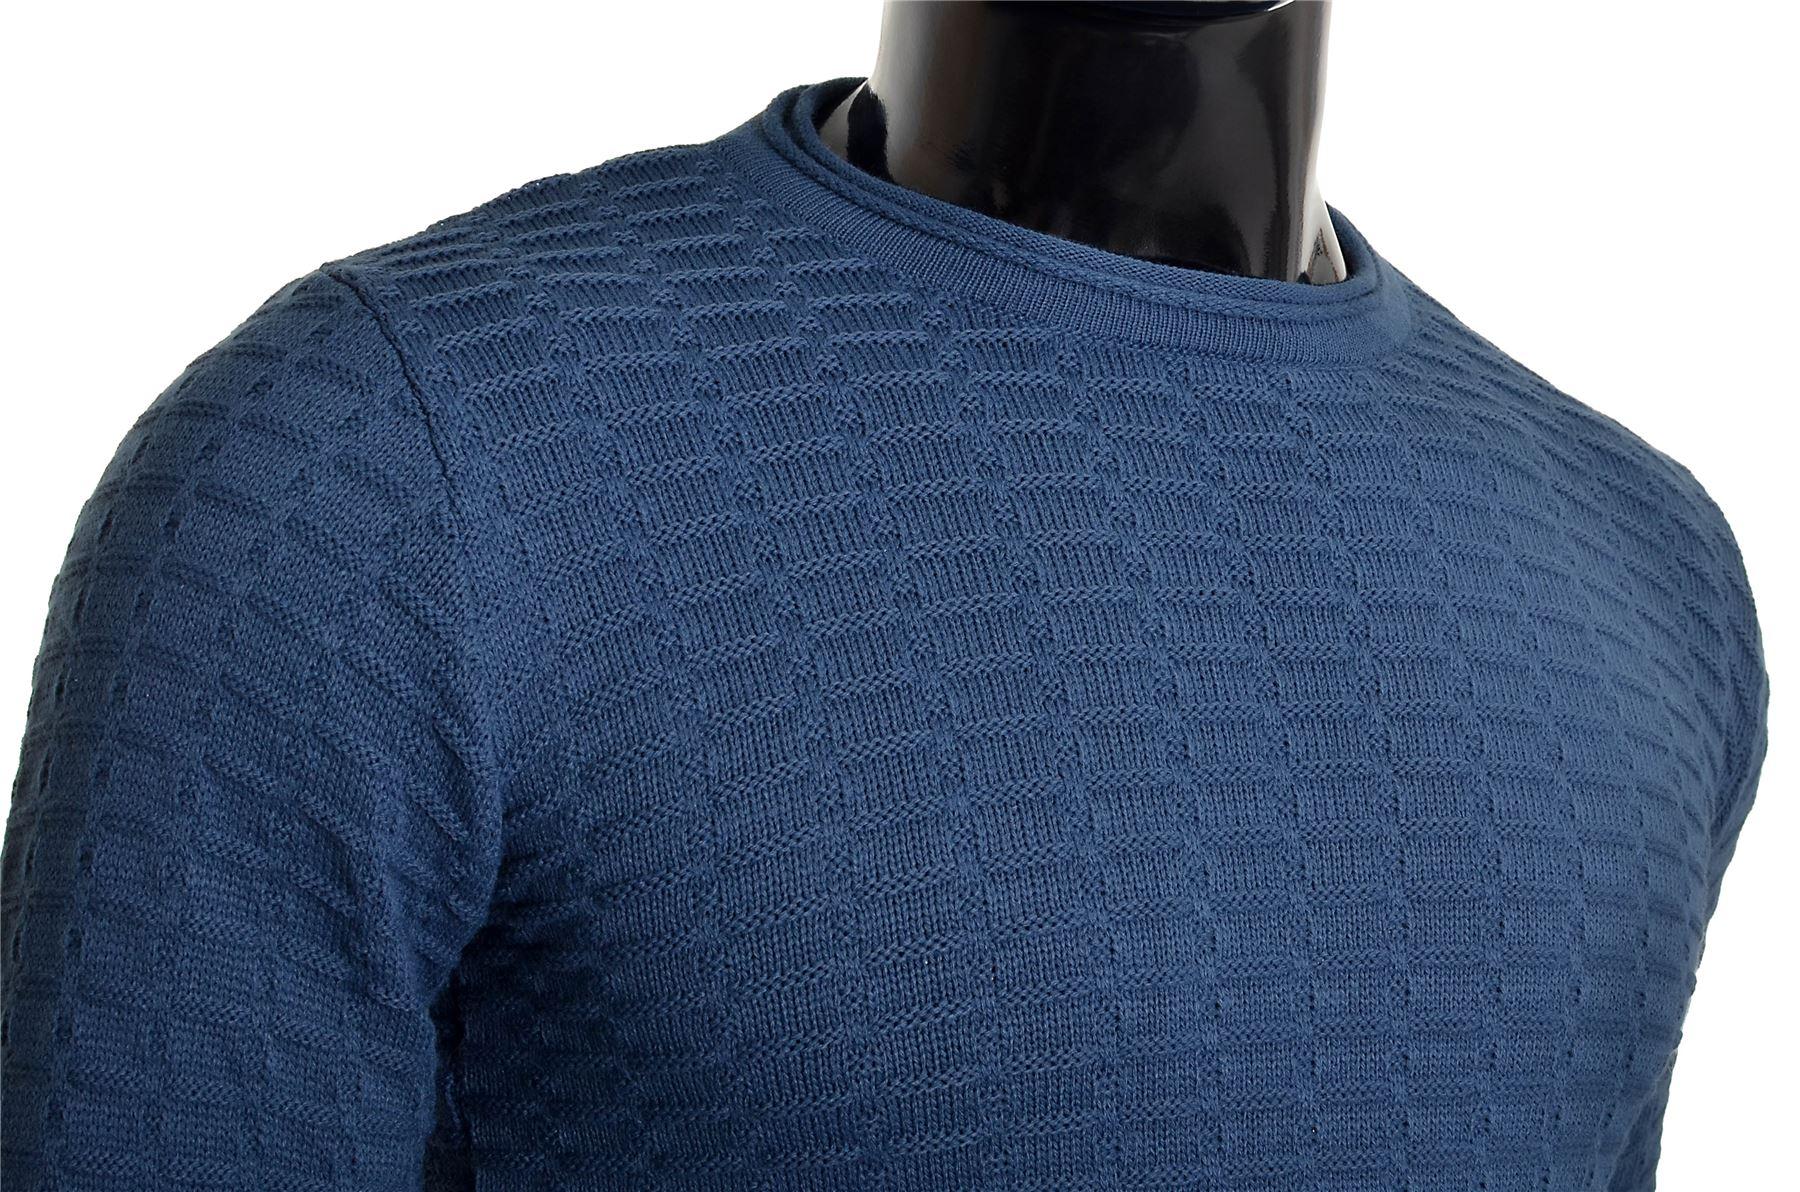 Men-039-s-Jumper-Striped-Knit-Smart-Long-Sleeve-Sweater-Crew-Neck-Top-Slim-Fitness thumbnail 20